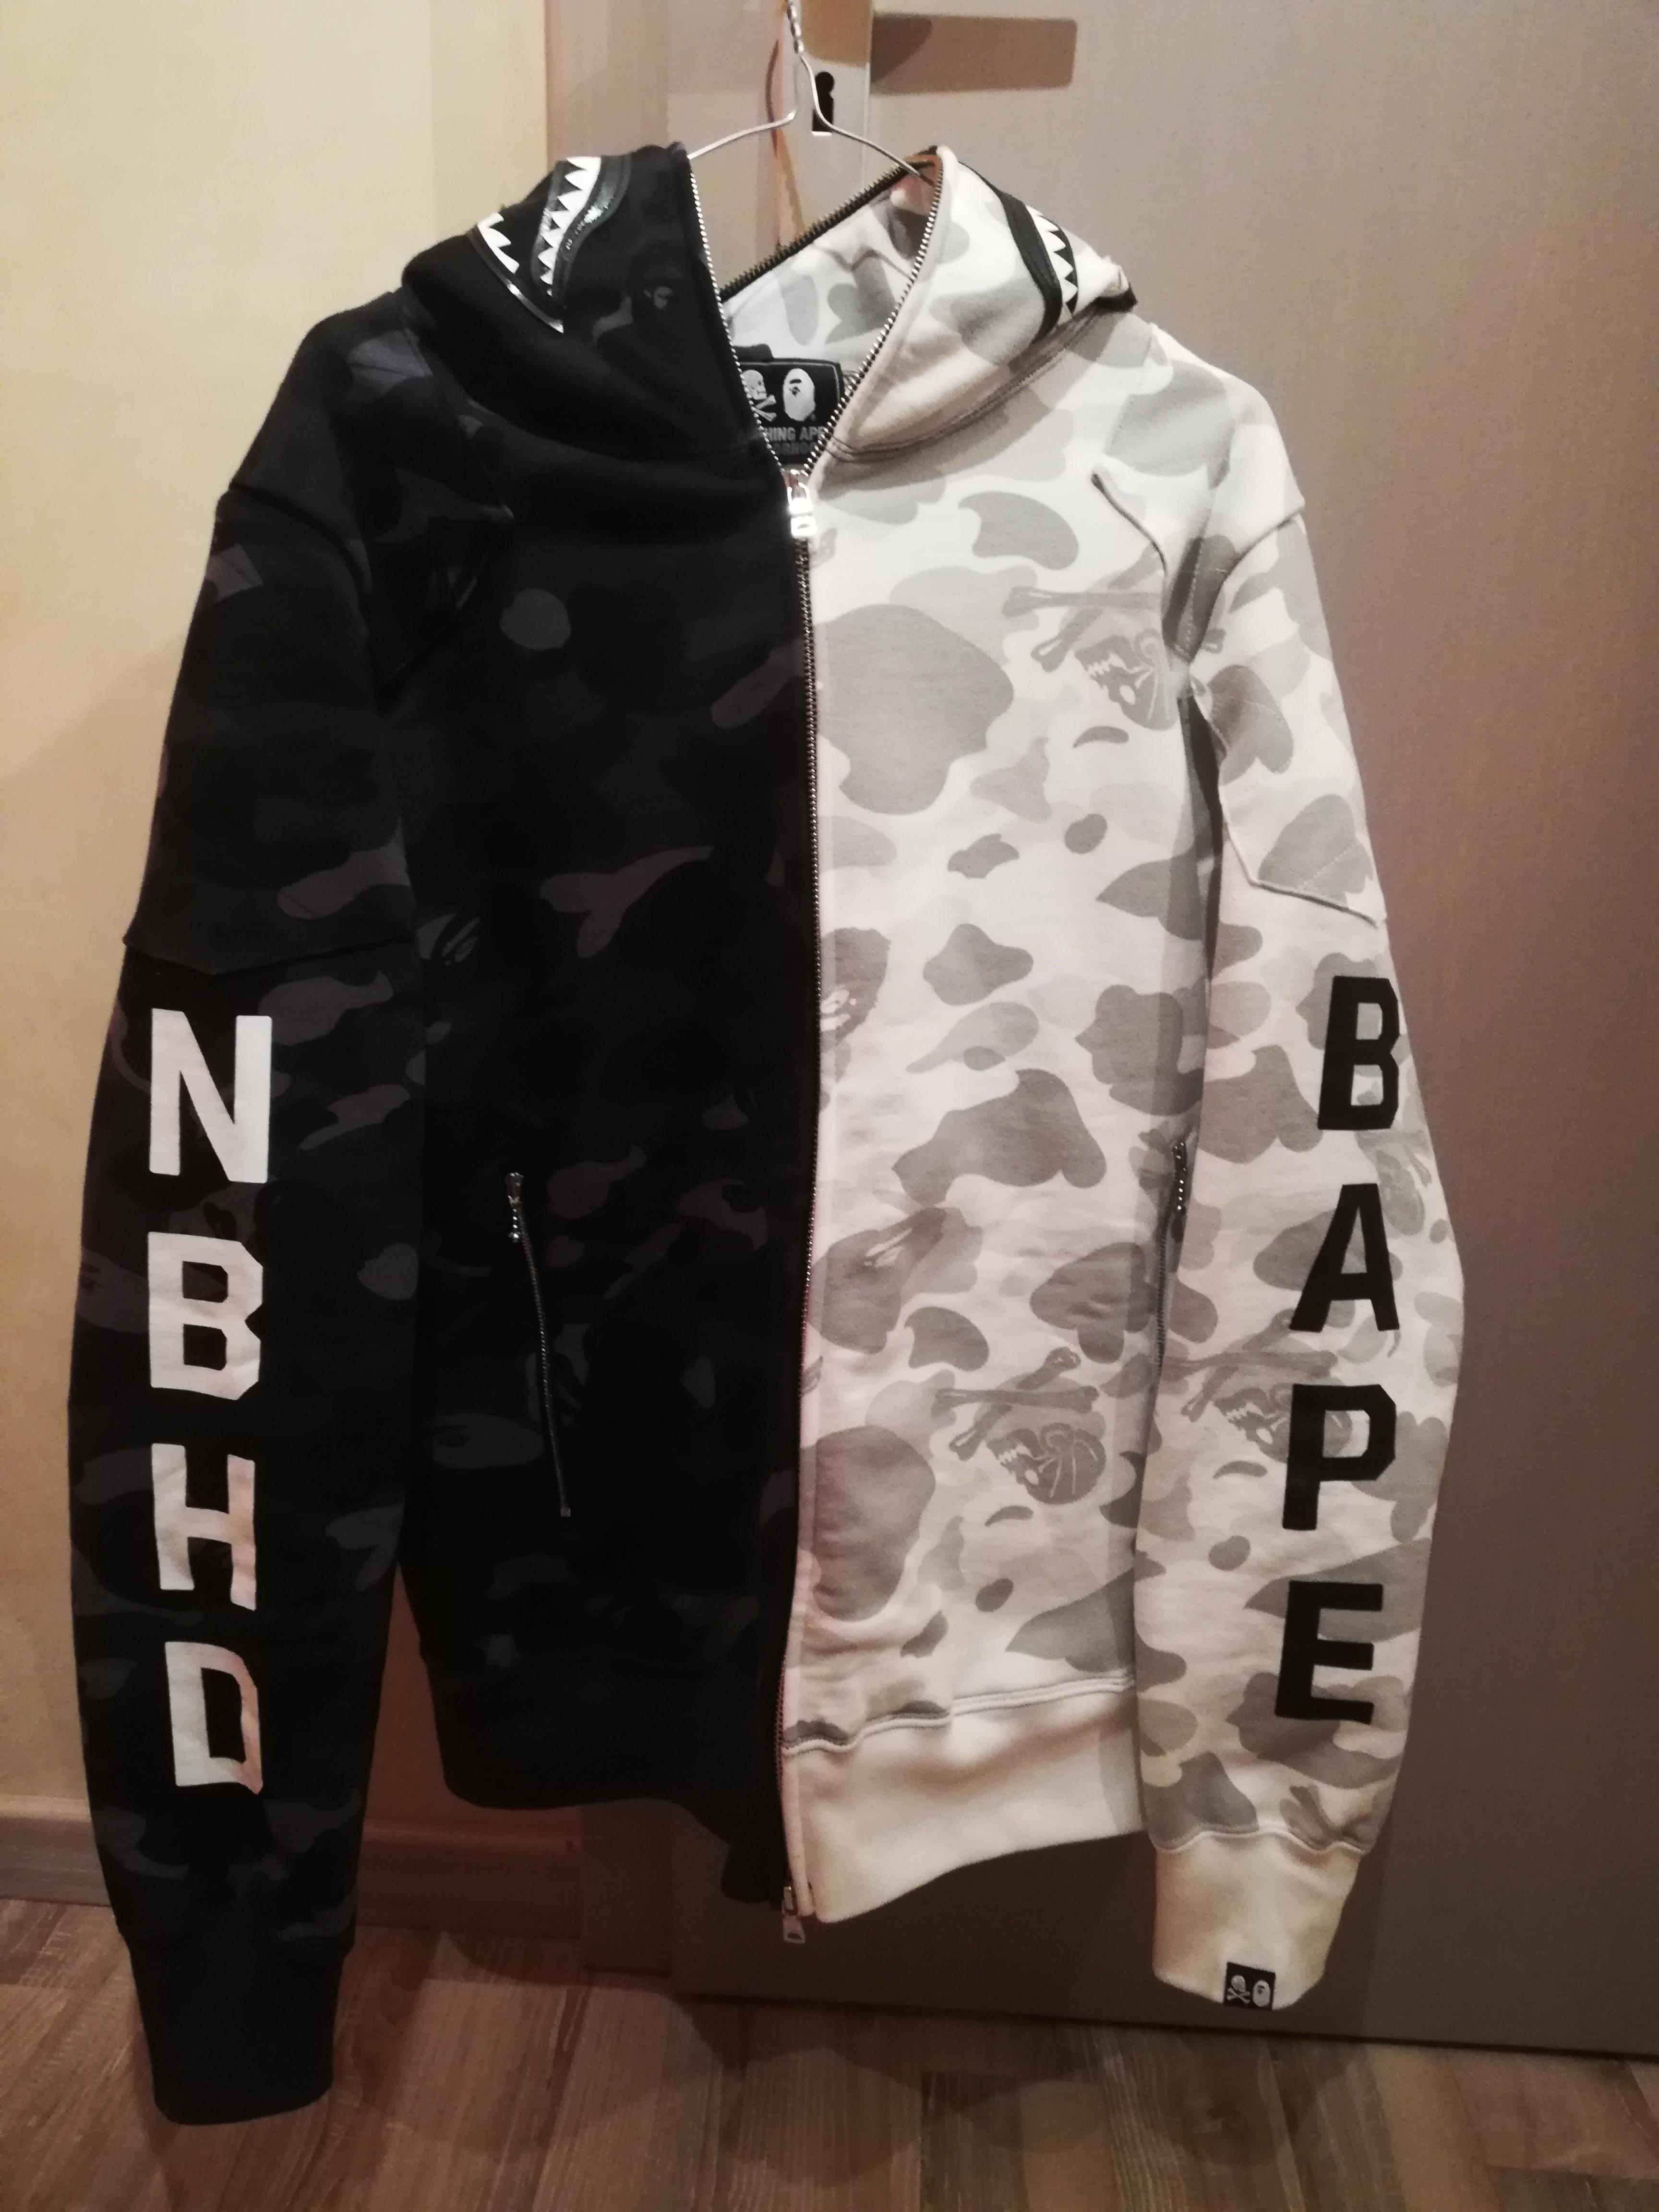 2f76eccf9ceb Bape A Bathing Ape (Bape) x Neighborhood camo shark full zip hoodie Size l  - Sweatshirts   Hoodies for Sale - Grailed